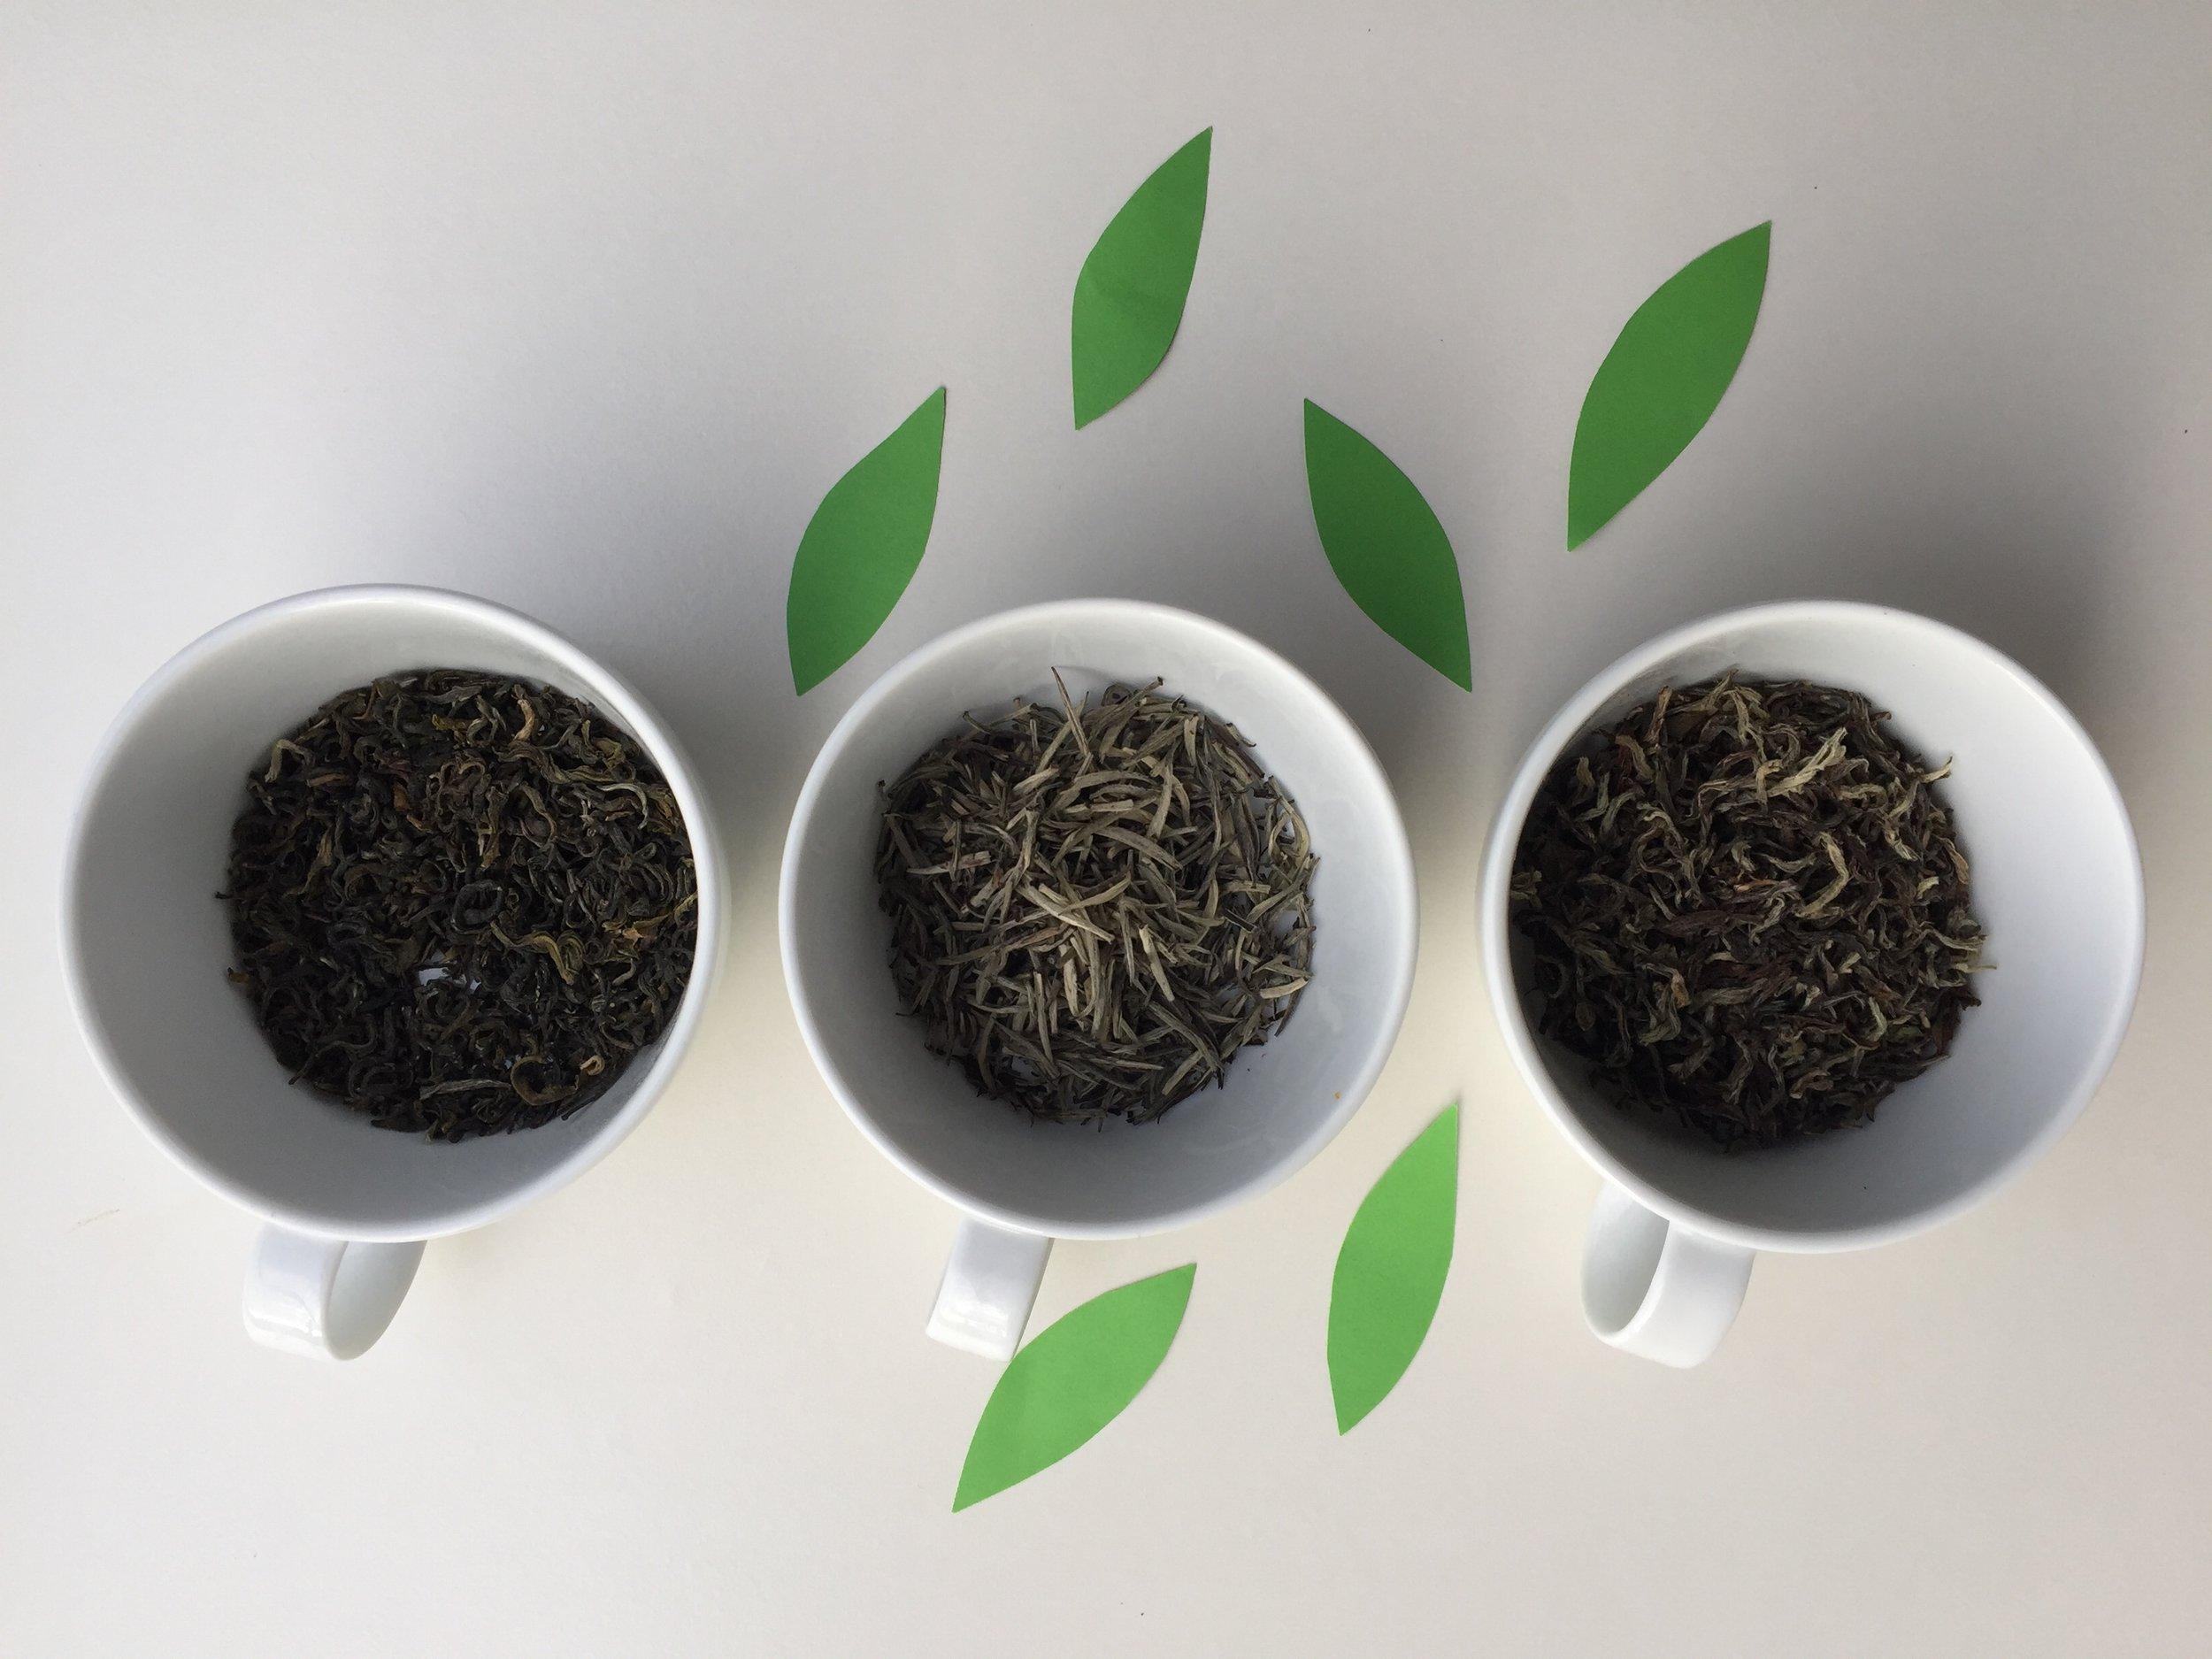 Other Tea - green tea subscription box - loose tea